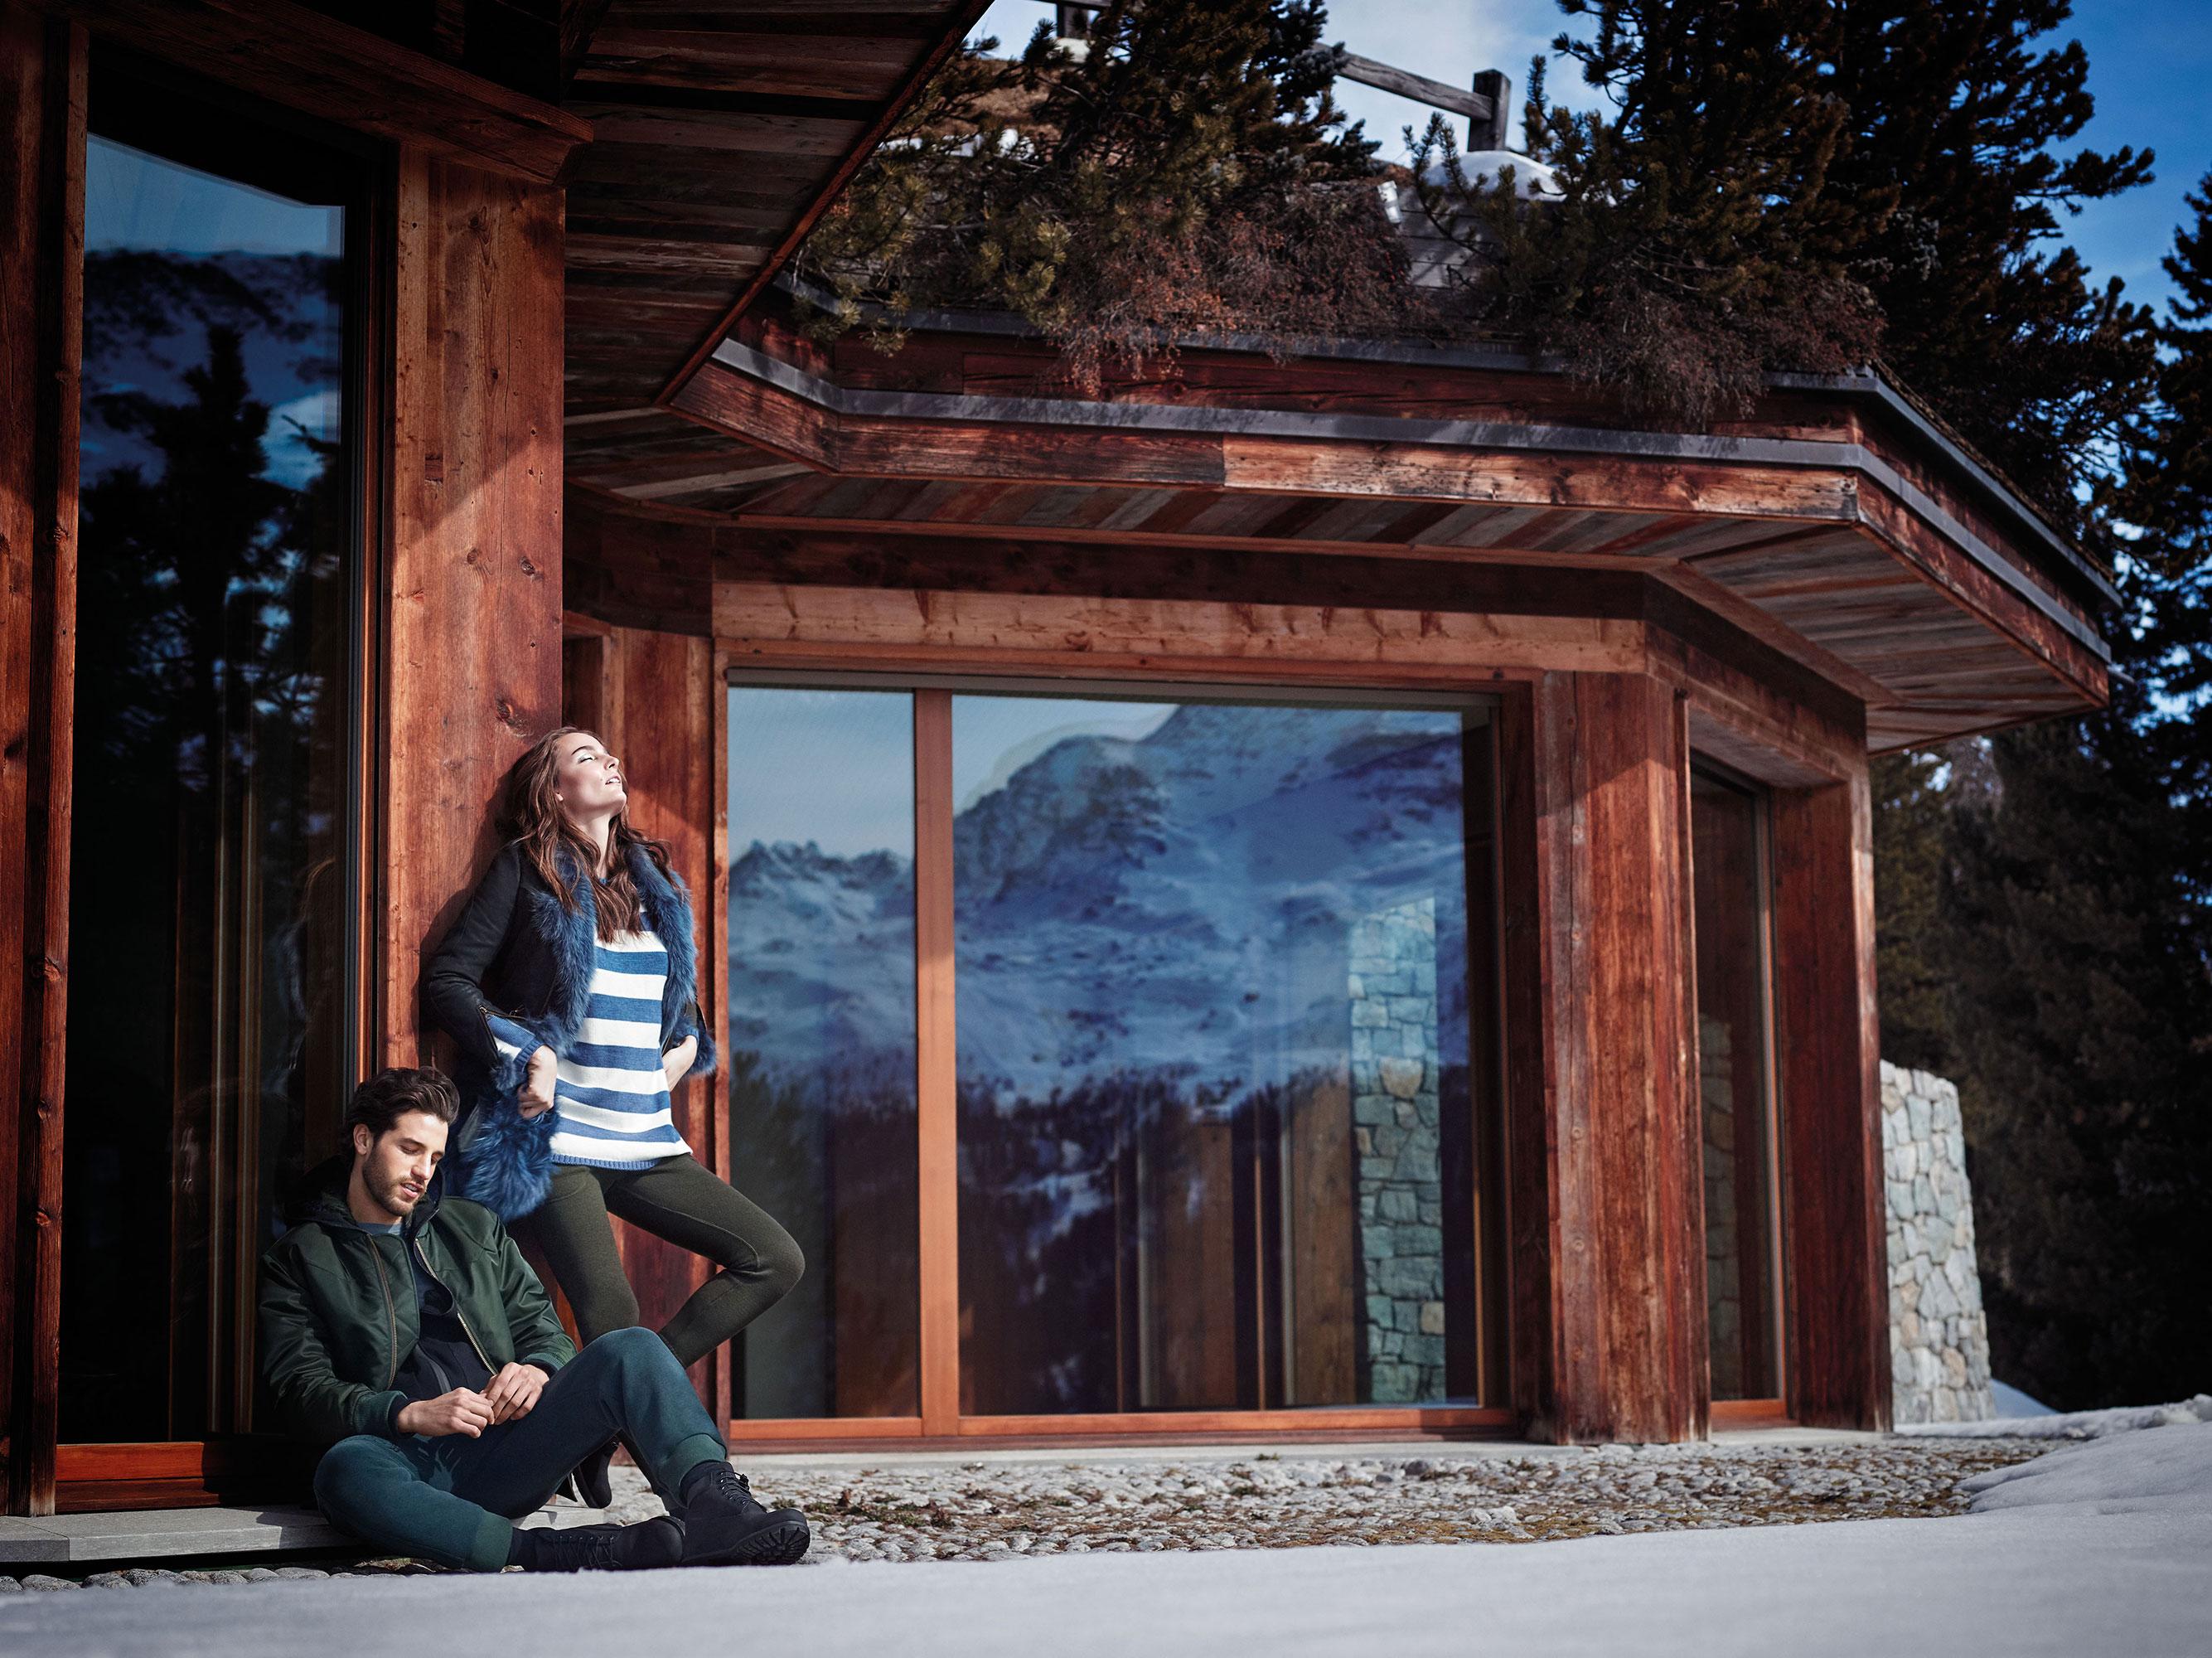 Mr & Mrs FW 2017/2018 – Look Book | Matteo Gastel | Mr & Mrs | Numerique Retouch Photo Retouching Studio